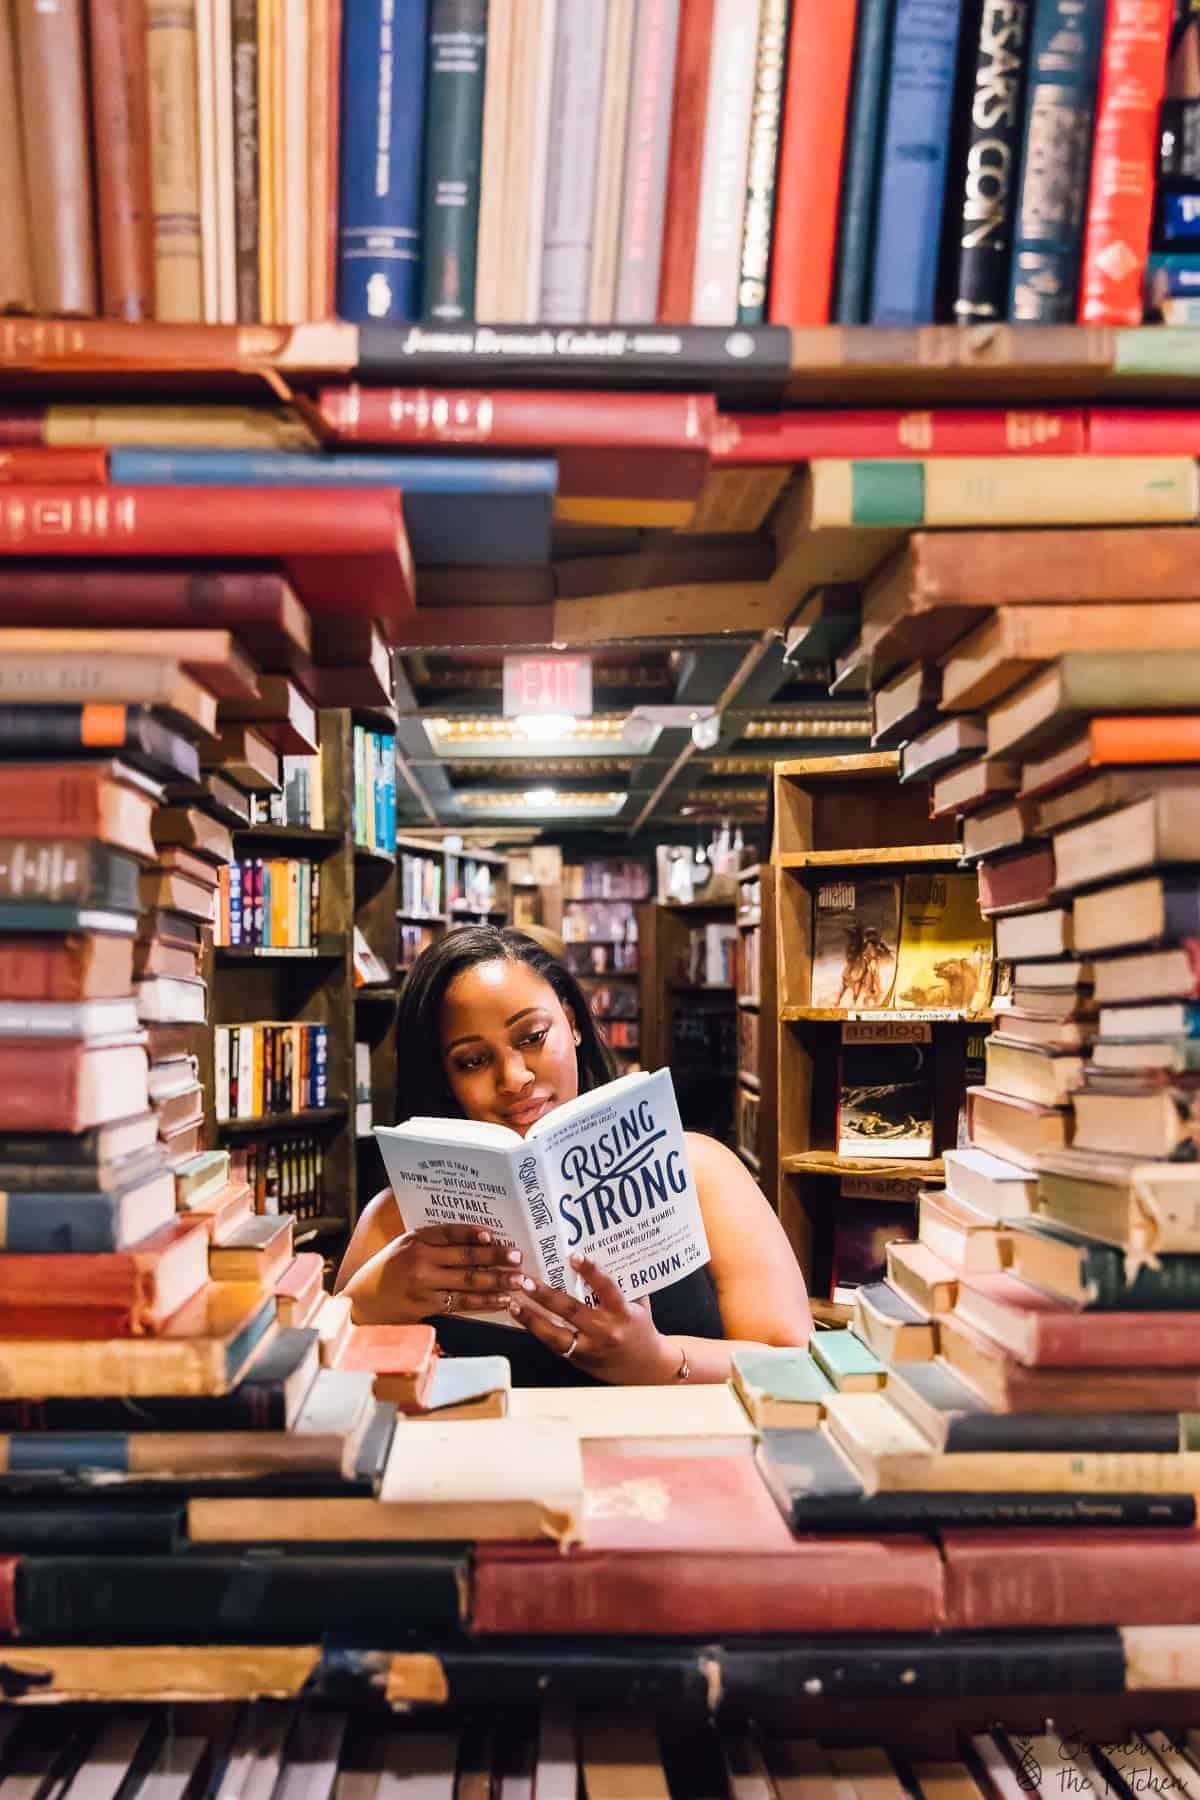 Jessica reading a book in a bookstore.